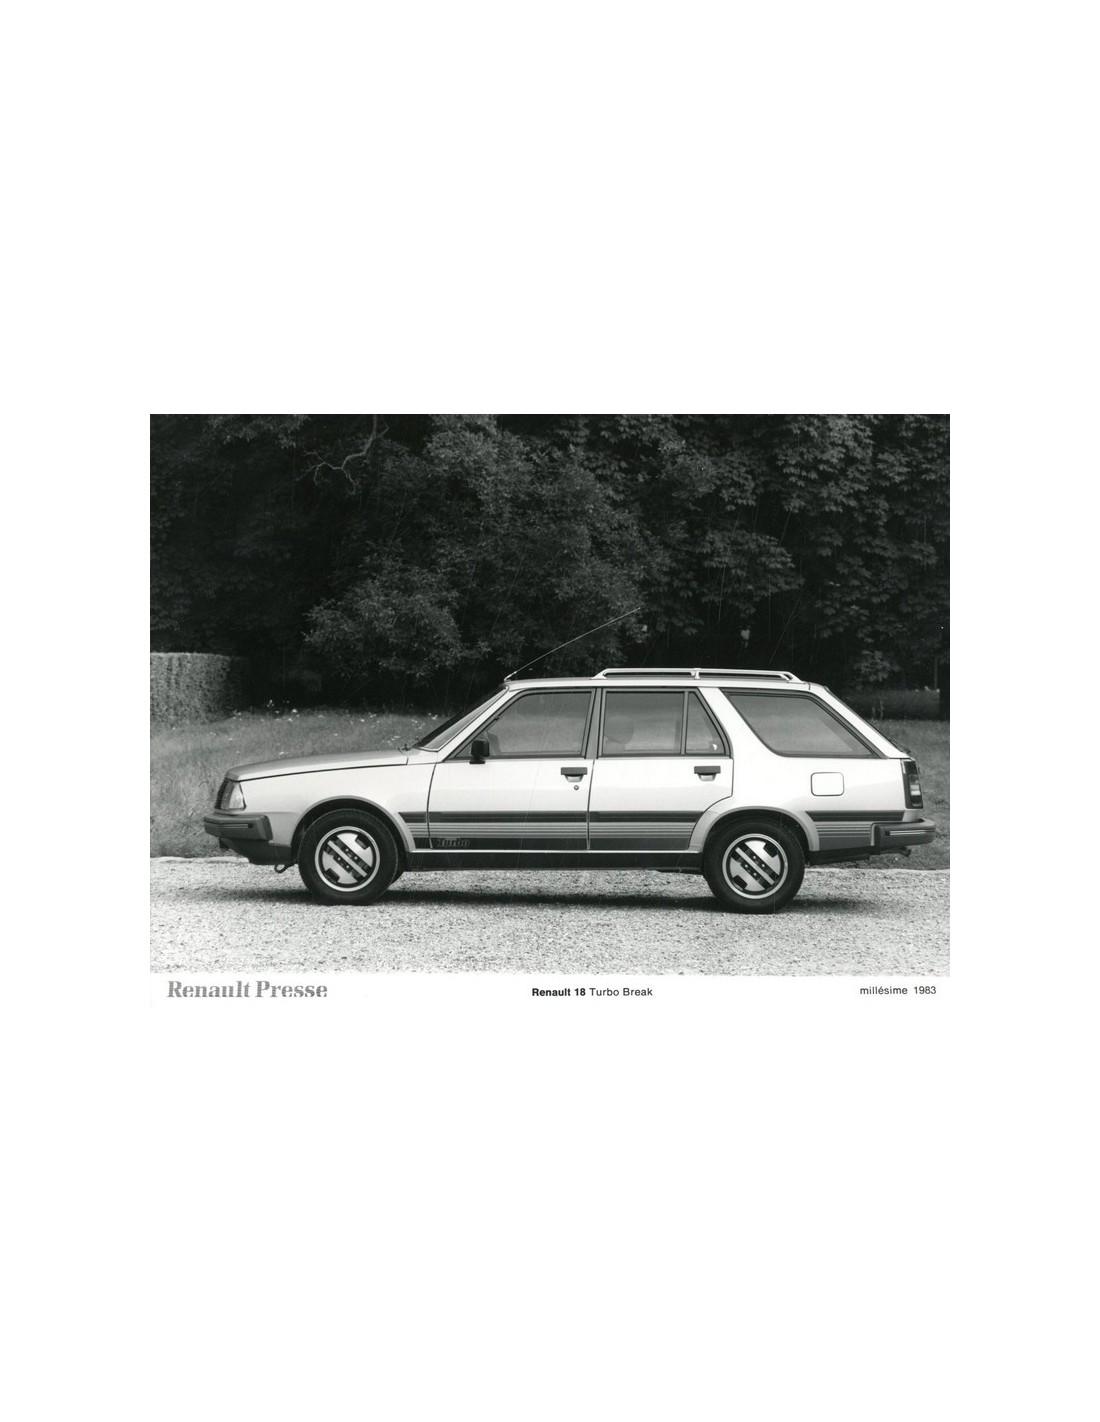 1983 Renault 18 Turbo Break Press Photo